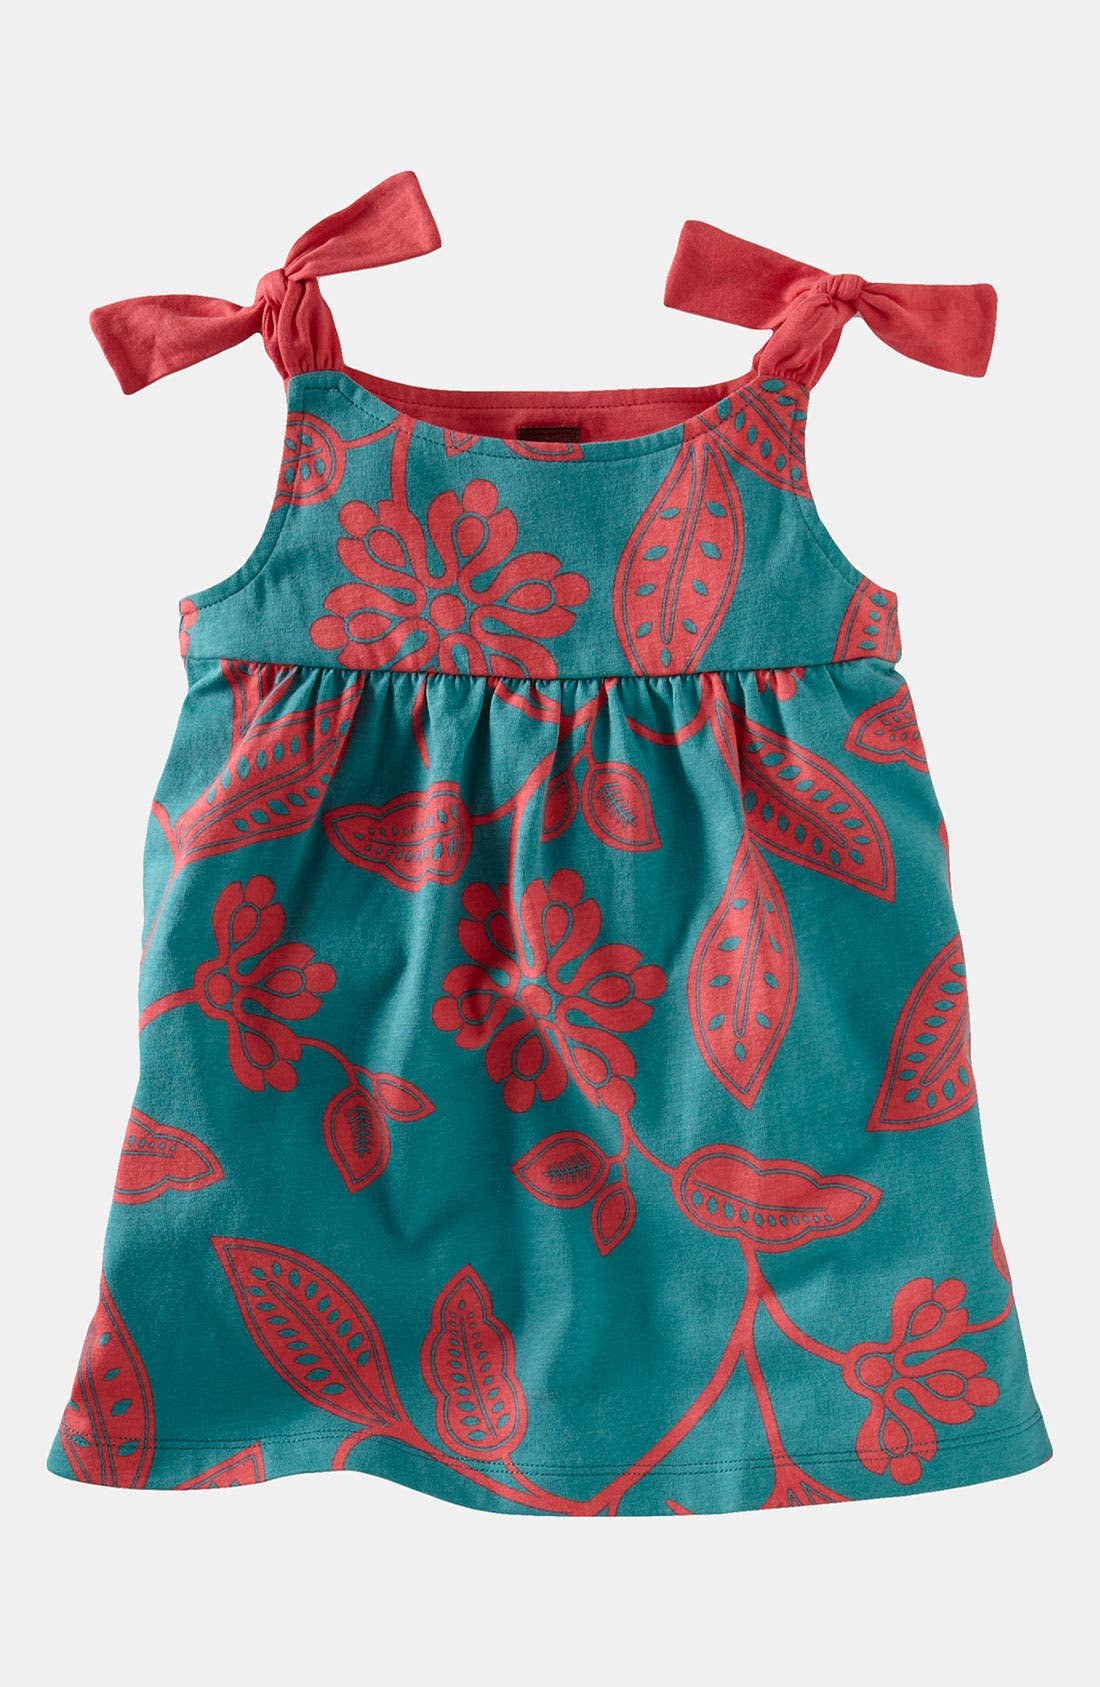 Alternate Image 1 Selected - Tea Collection 'Durban' Tunic (Little Girls & Big Girls)